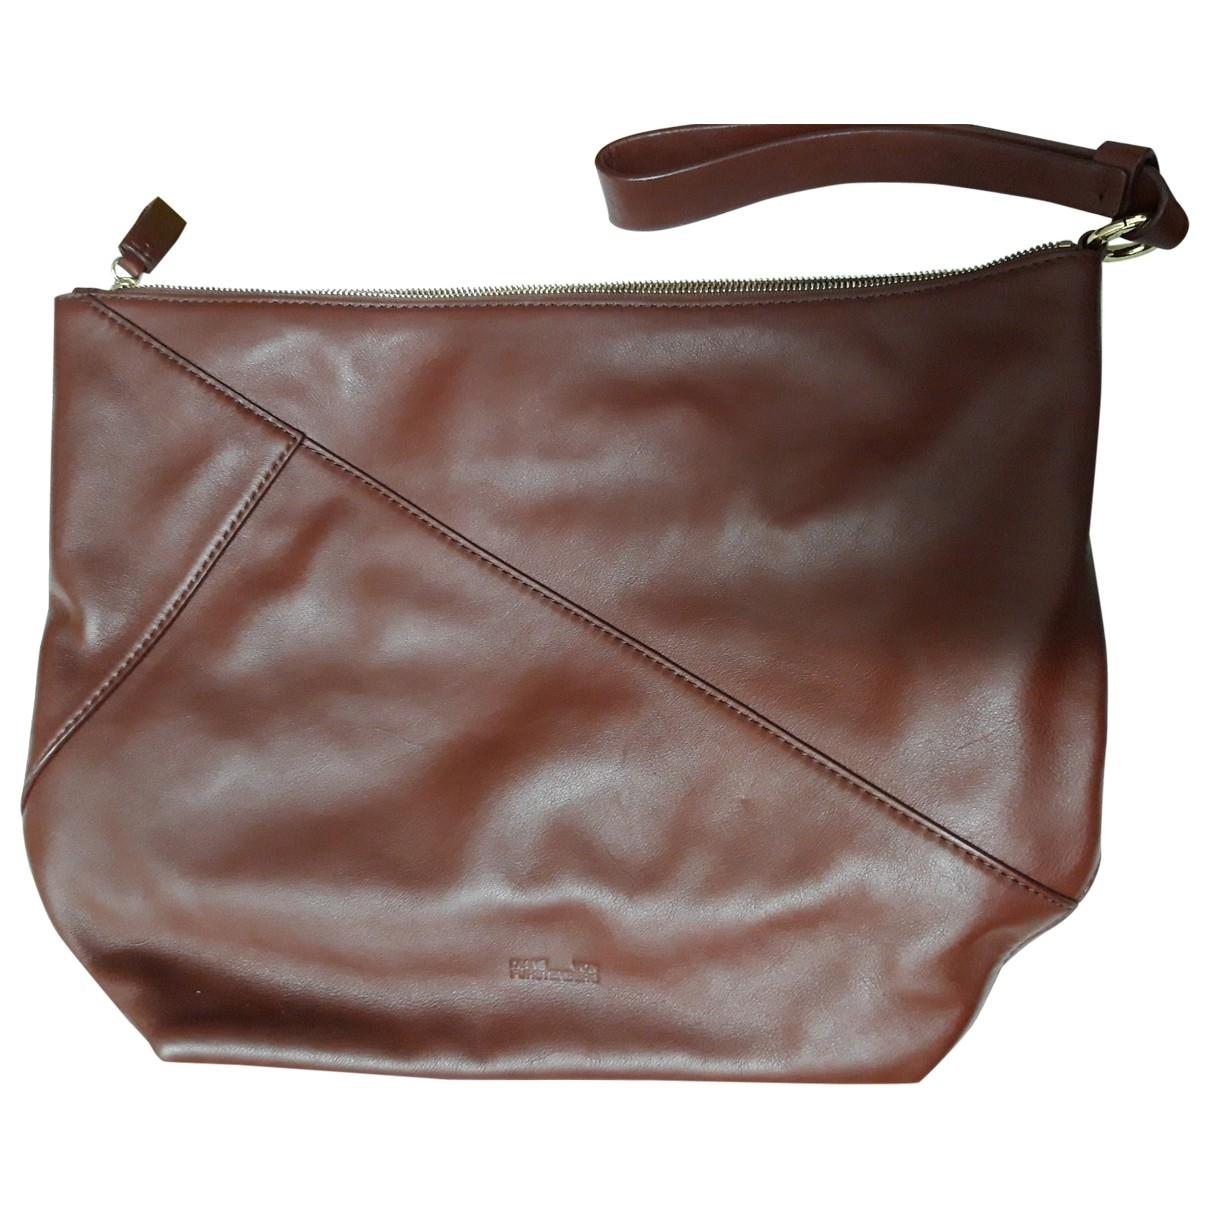 Diane Von Furstenberg \N Burgundy Leather Clutch bag for Women \N